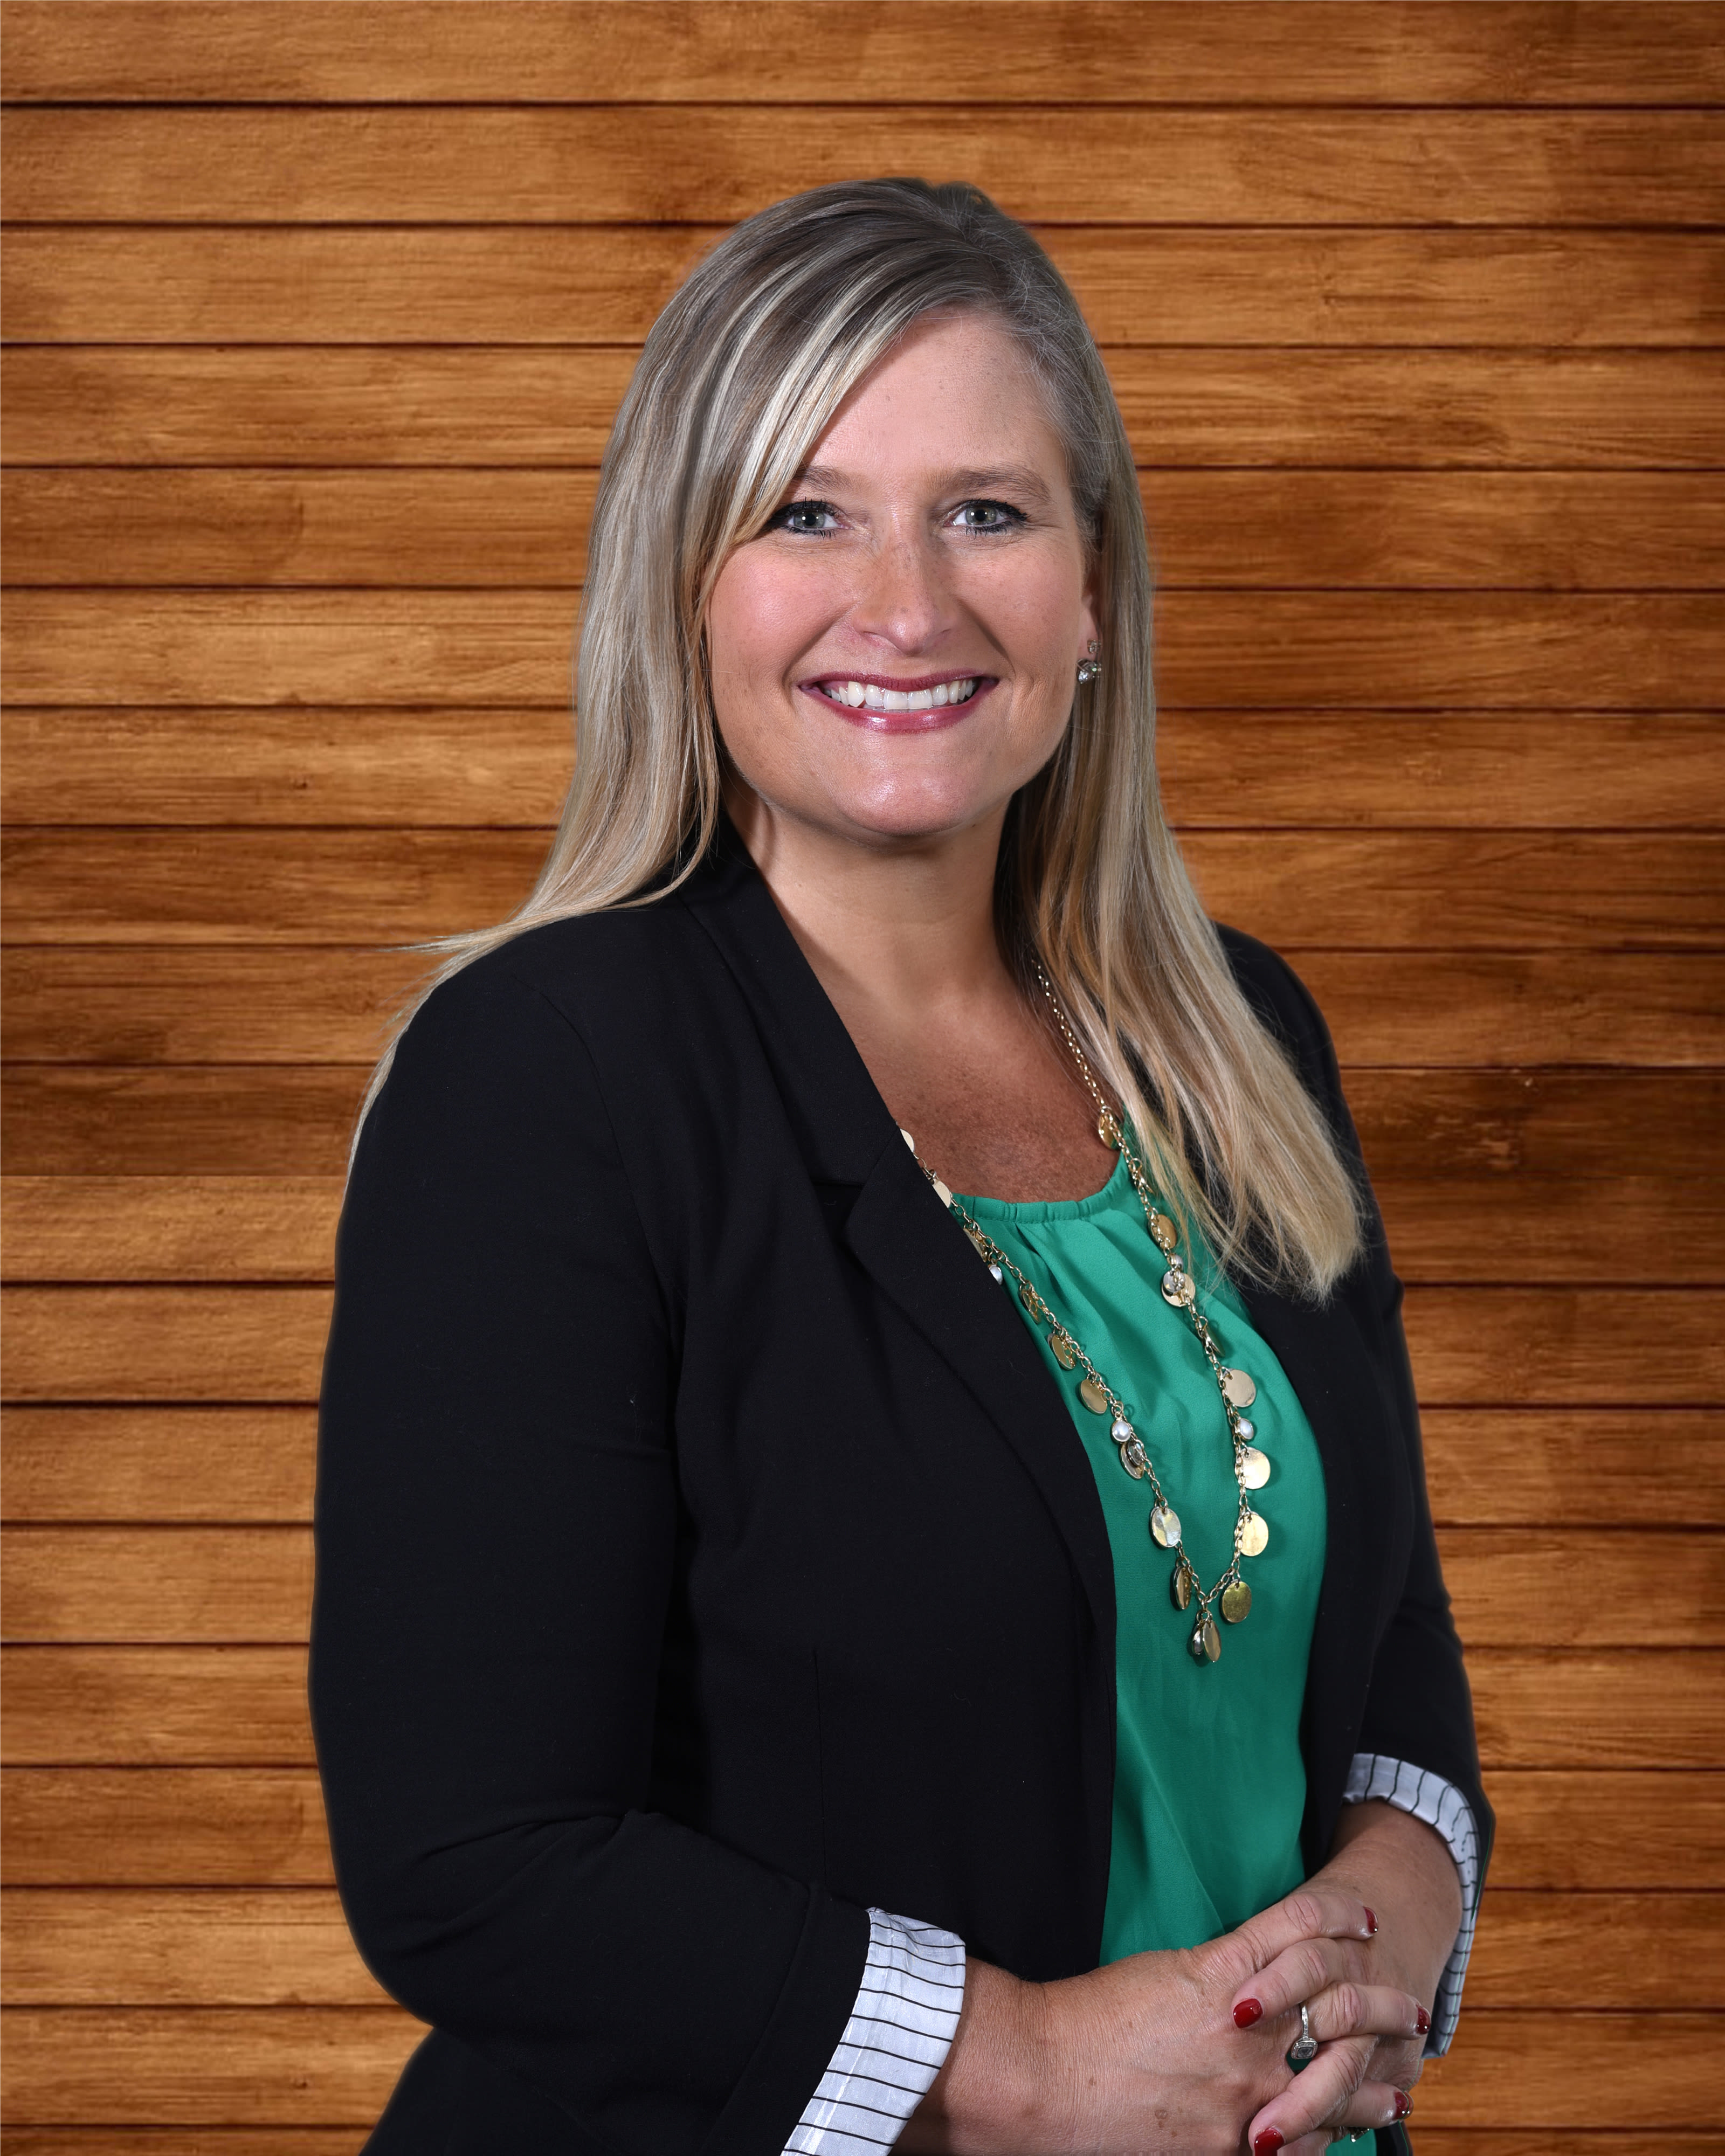 Kristin Fogle, Chief People Officer at Elegance Living, LLC